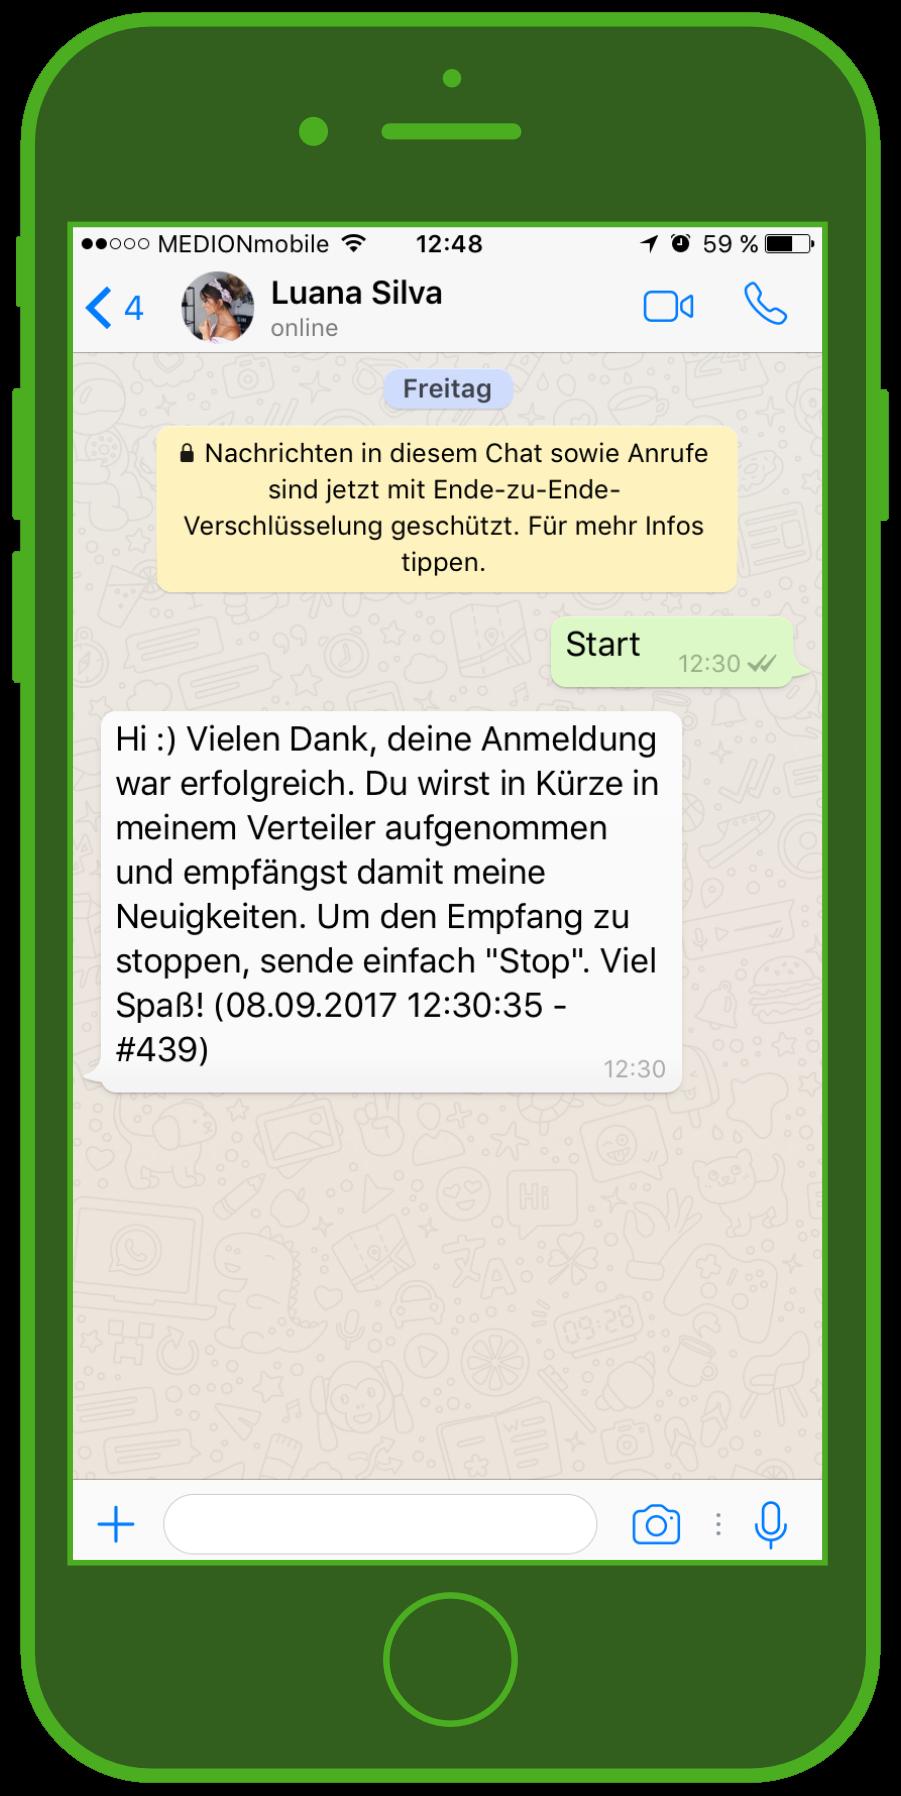 device-luana-silva-whatsapp-influencer-newsletter